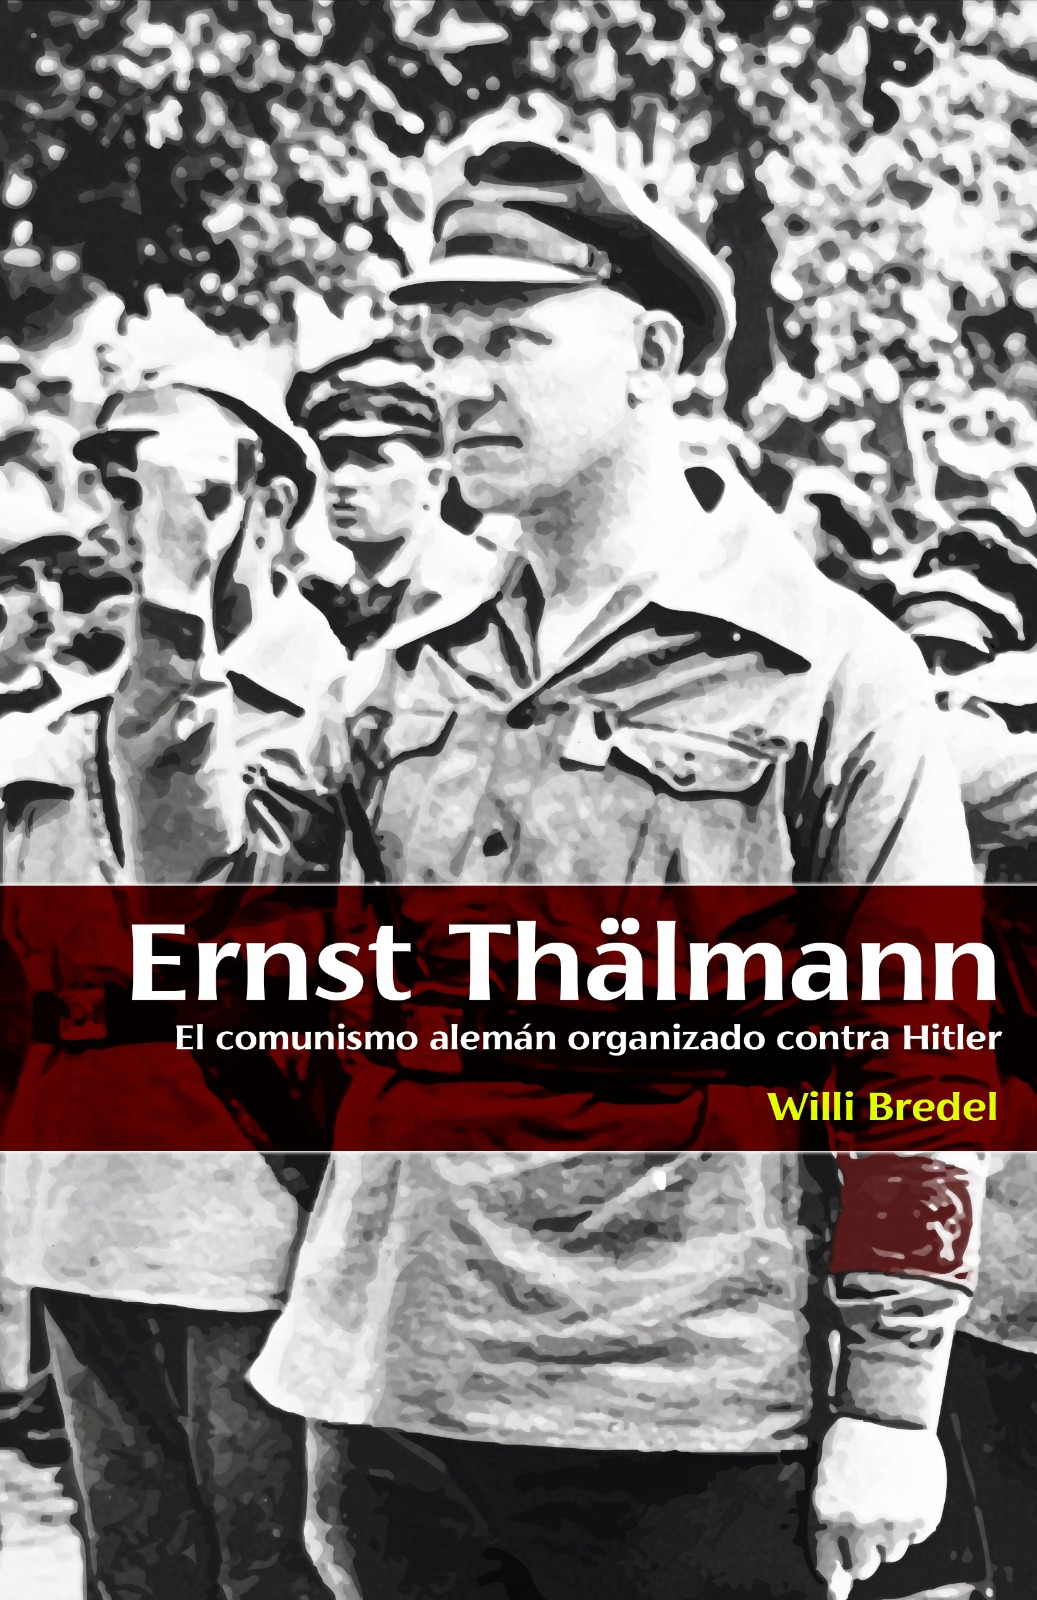 Memoria a Ernst Thälmann